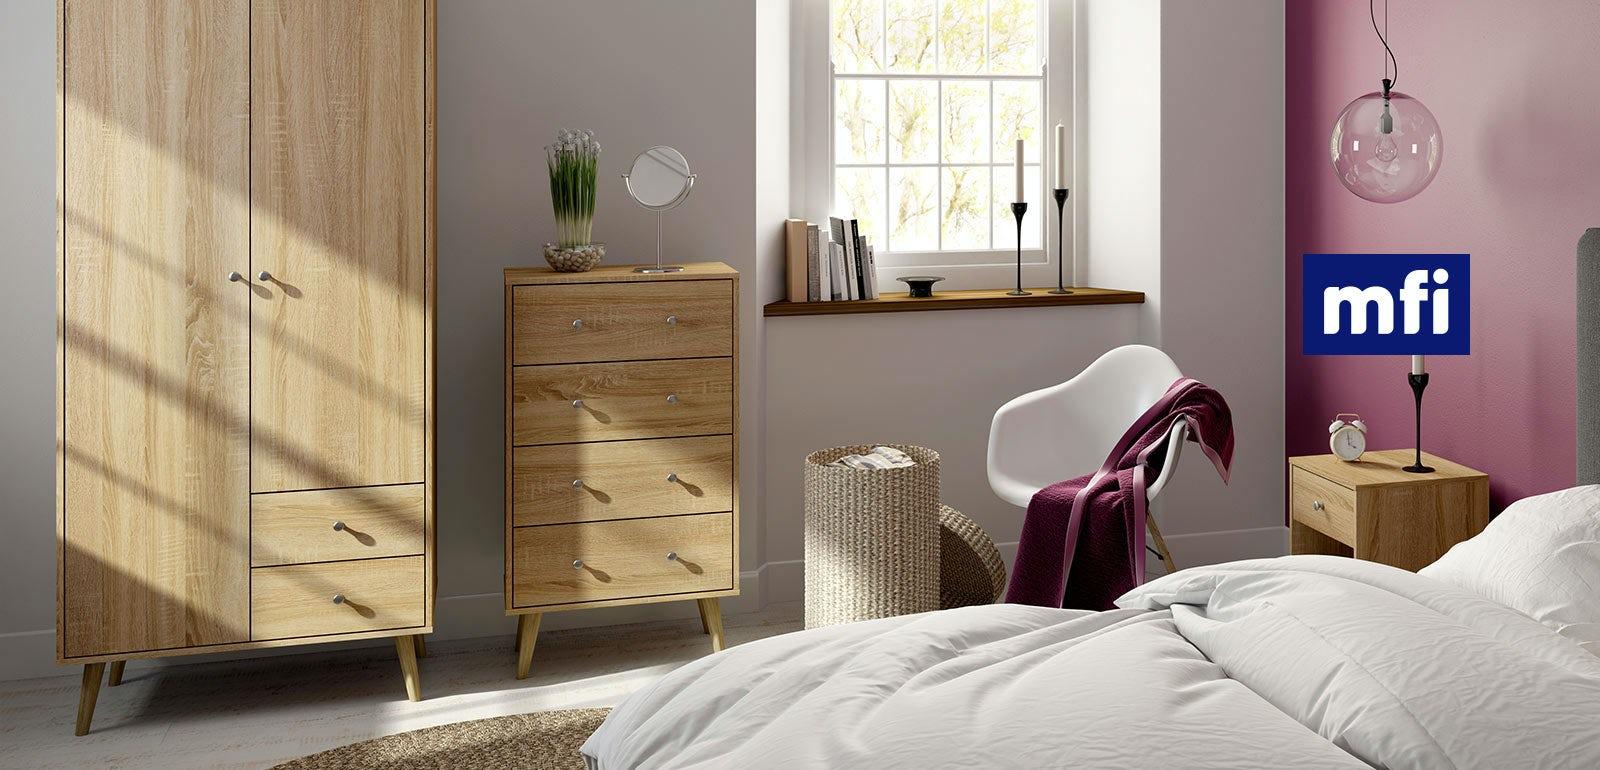 Light Walnut Bedroom Furniture The Mfi Bedroom Furniture Collection Victoriaplumcom